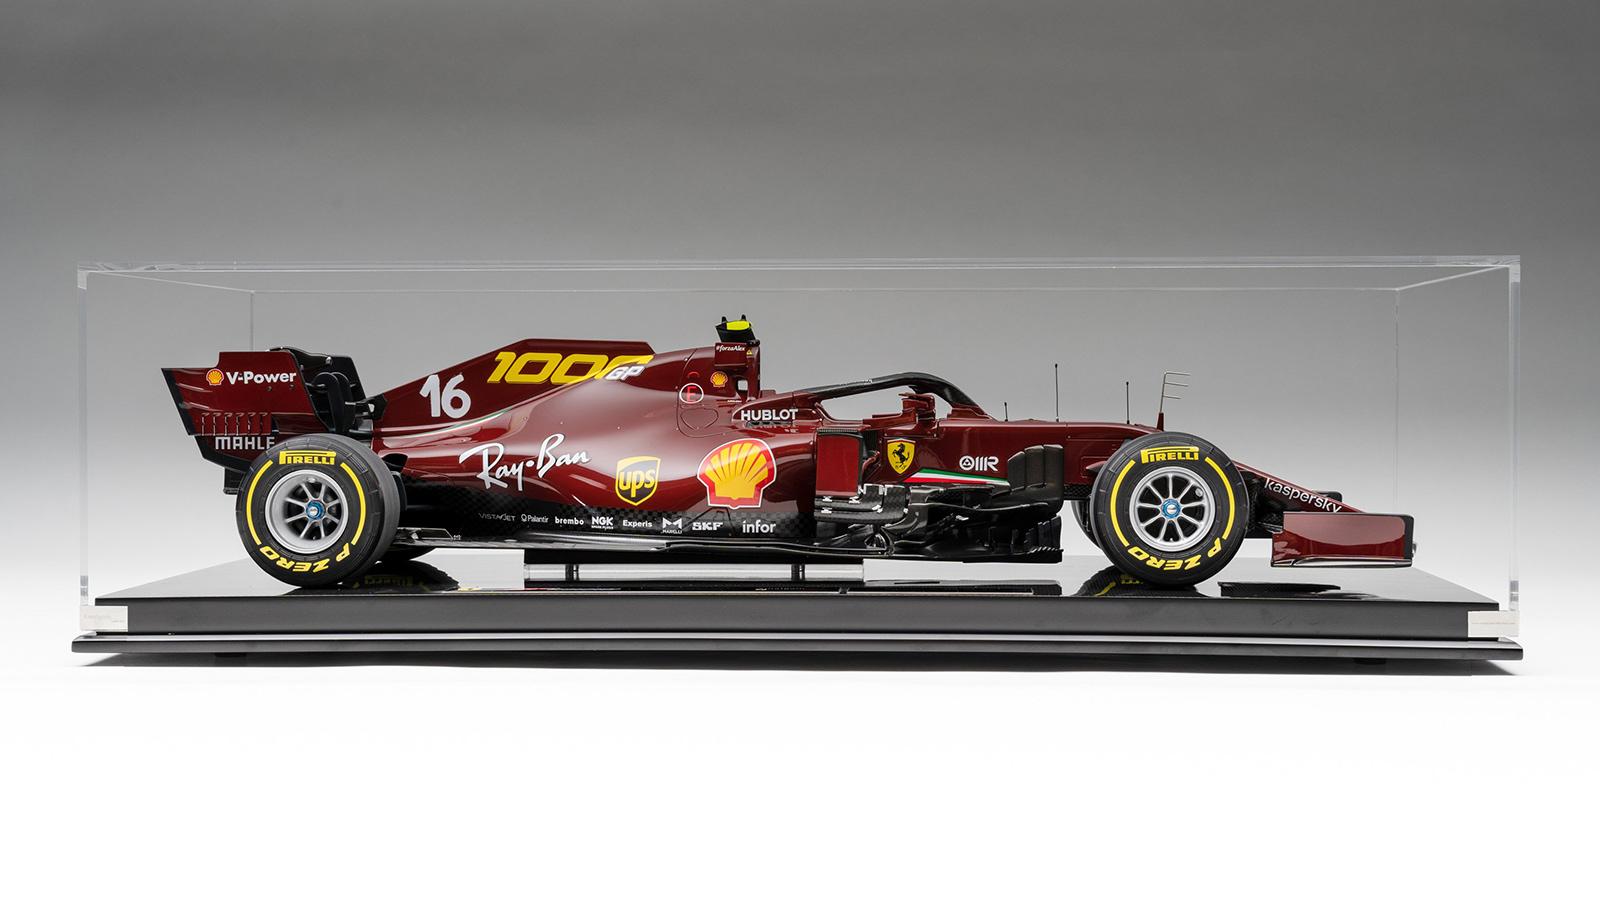 Amalgam Ferrari SF1000 - 1000th Grand Prix Livery - 2020 Tuscany Grand Prix